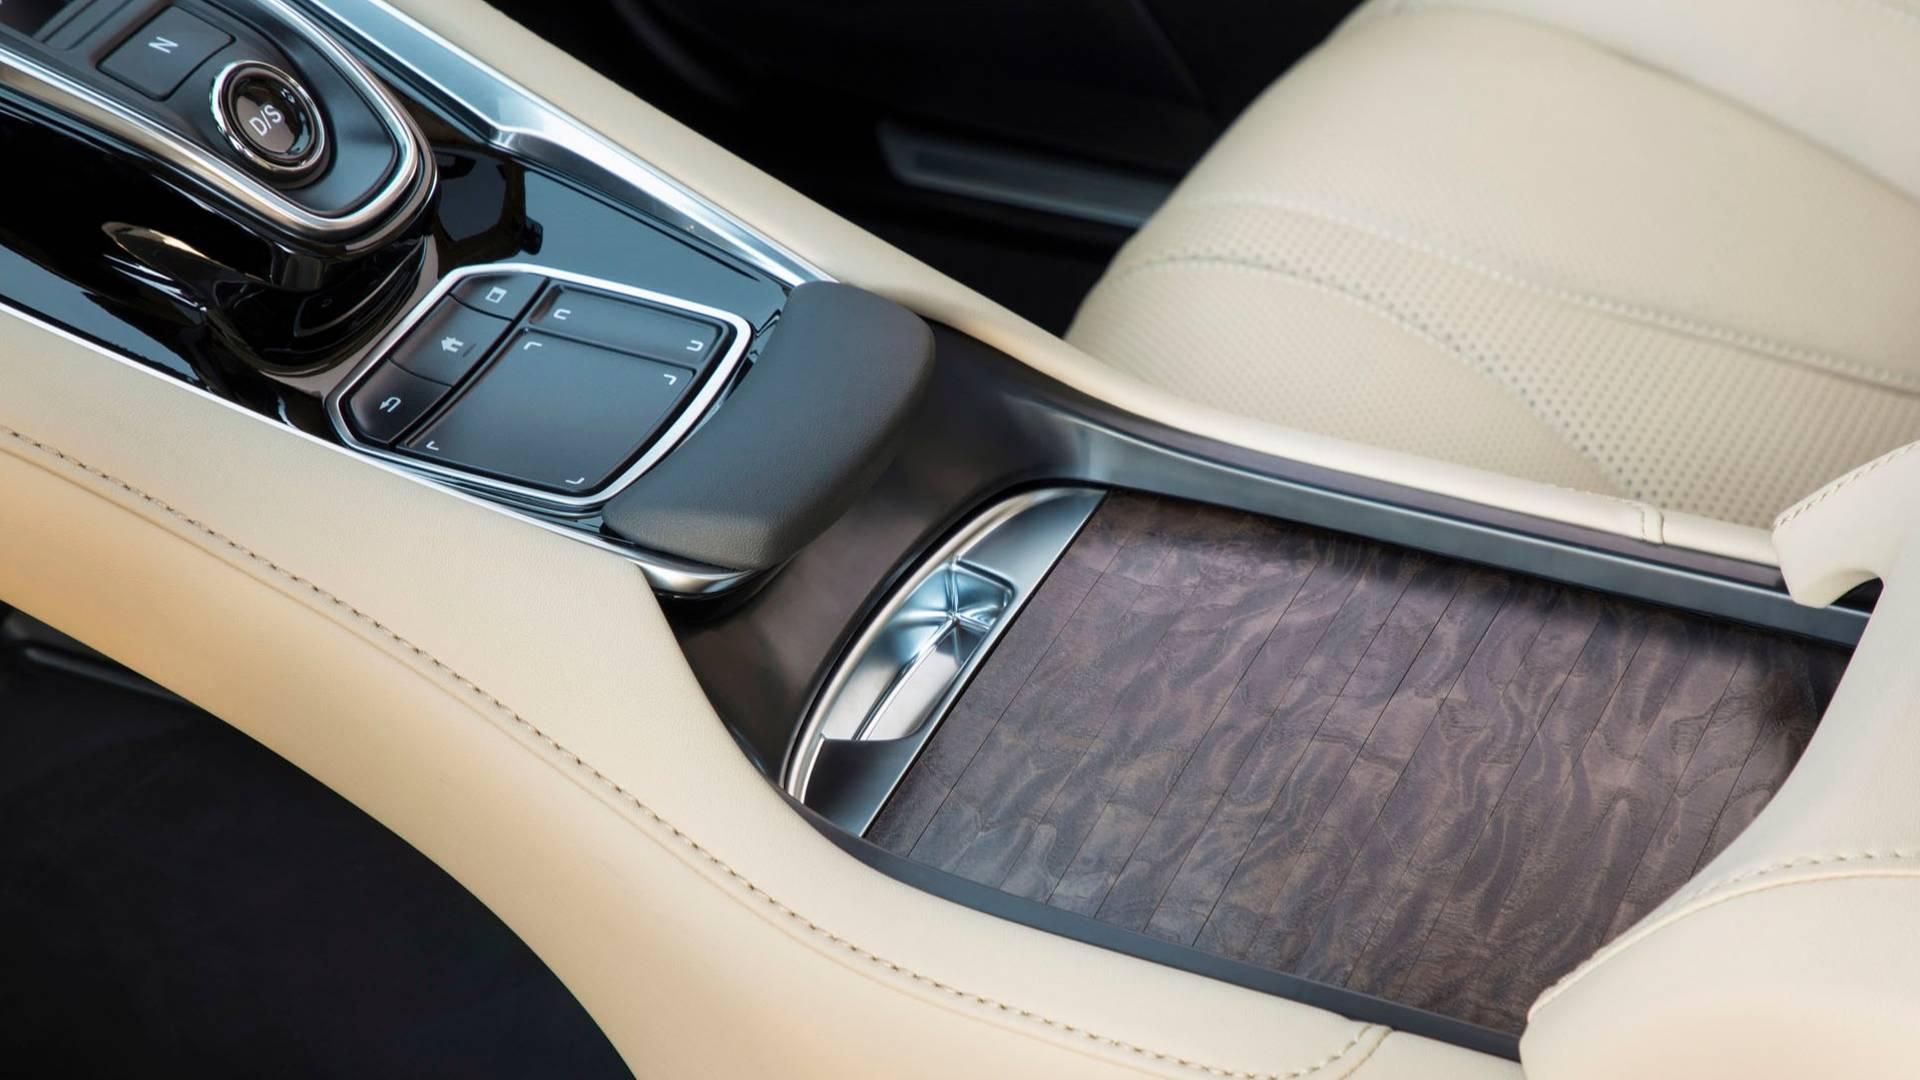 2020 Acura Rdx Adds Platinum White Exterior Color Autoevolution